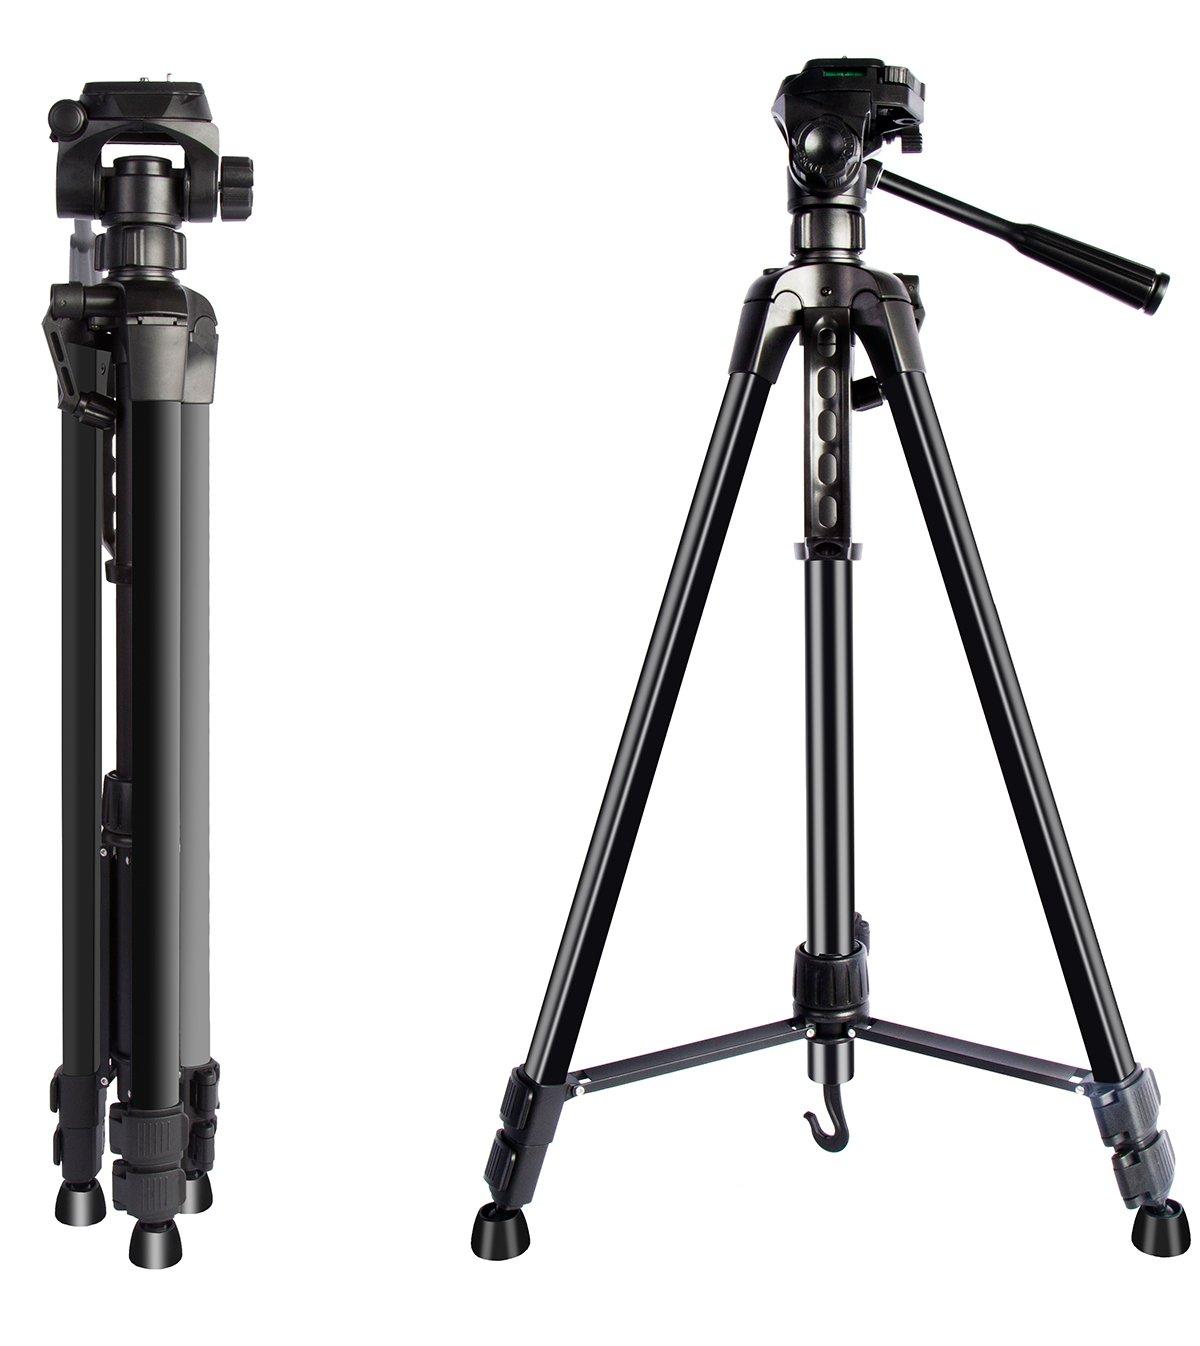 xqmart 62インチ軽量三脚forデジタルカメラビデオカメラアウトドアTralvel写真アクティビティ   B07B7DQL3Y